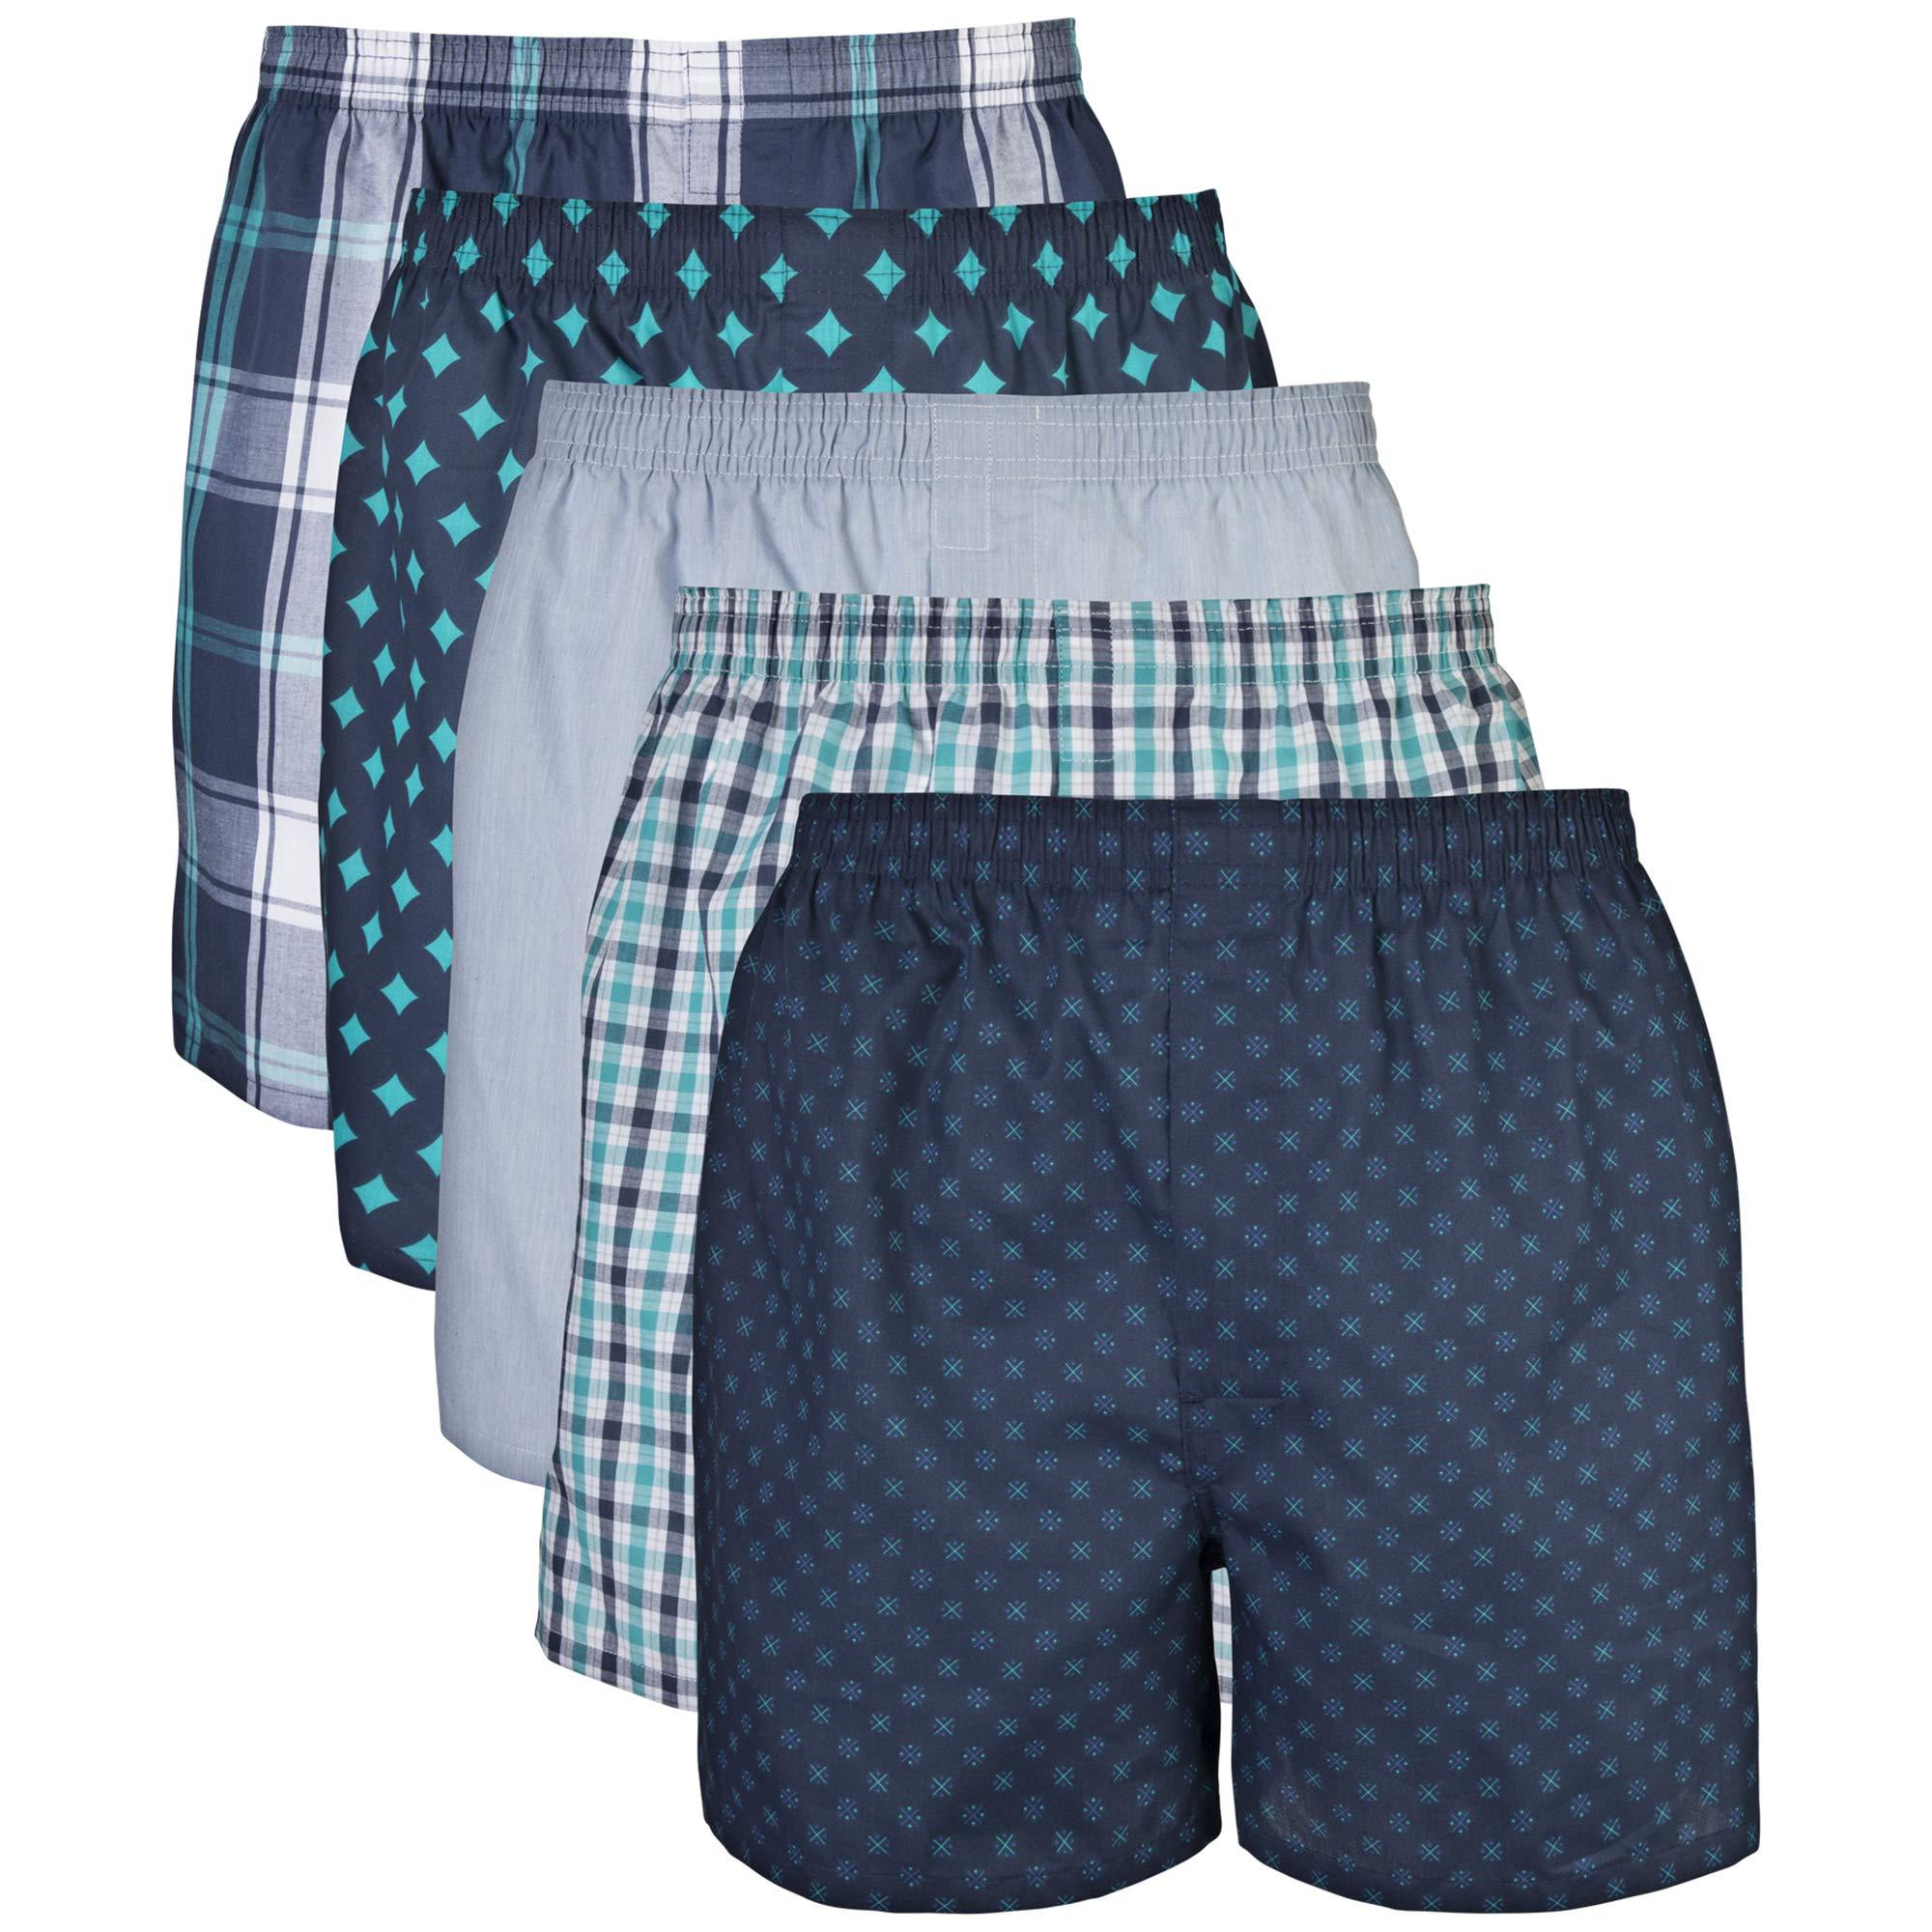 Gildan Men's Woven Boxer Underwear (Pack of 5), Assorted Navy, Medium by Gildan